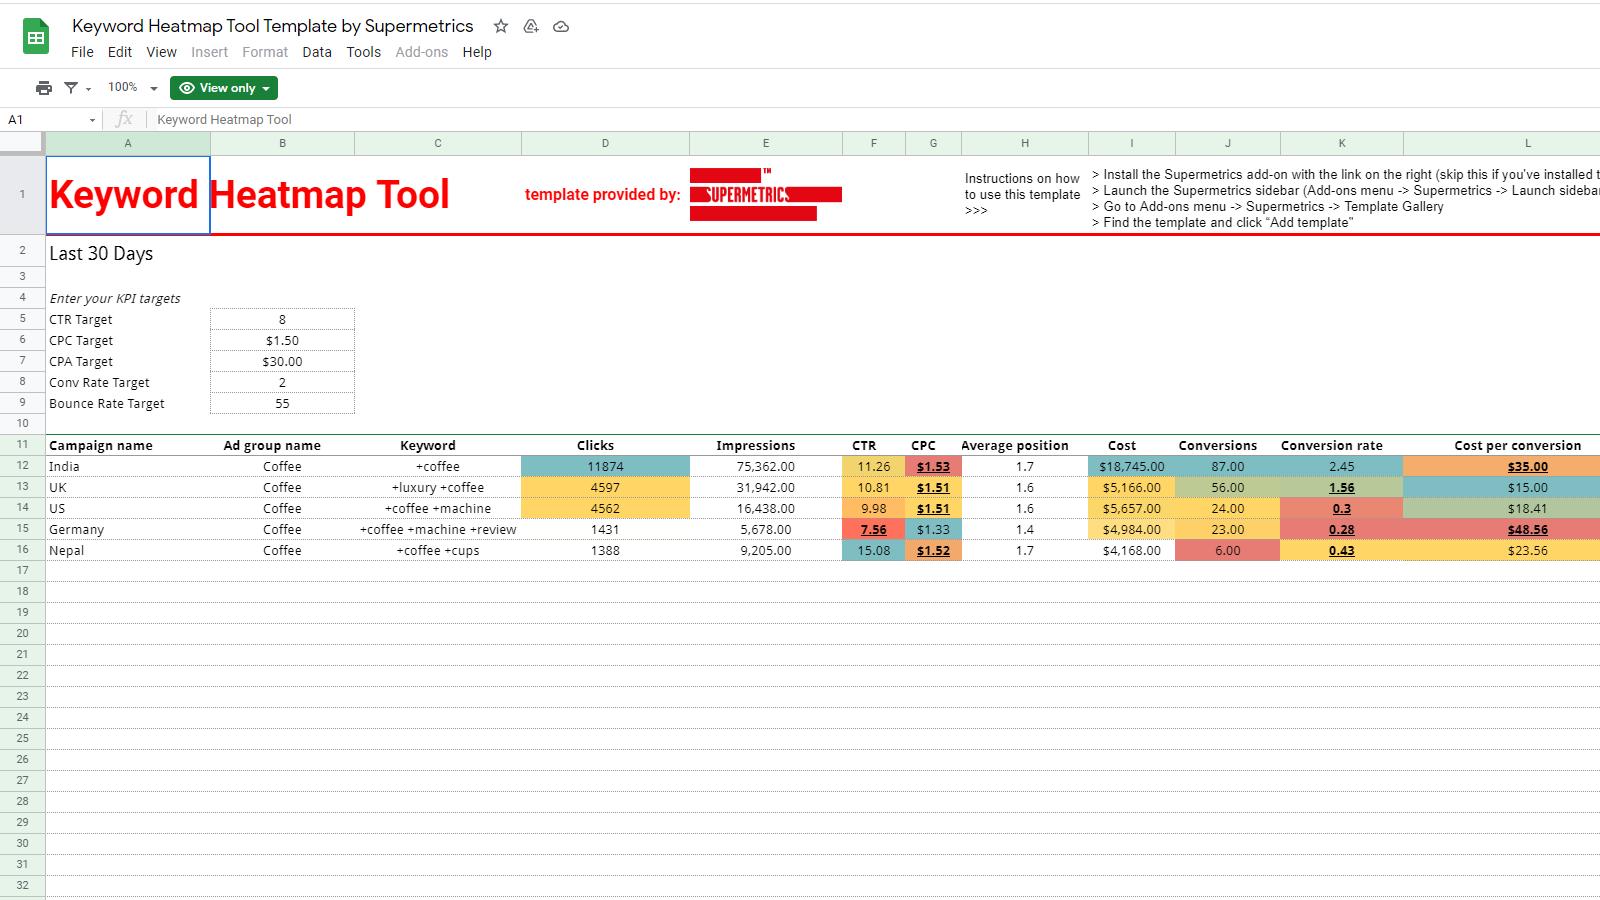 Google Ads keyword heatmap analysis template